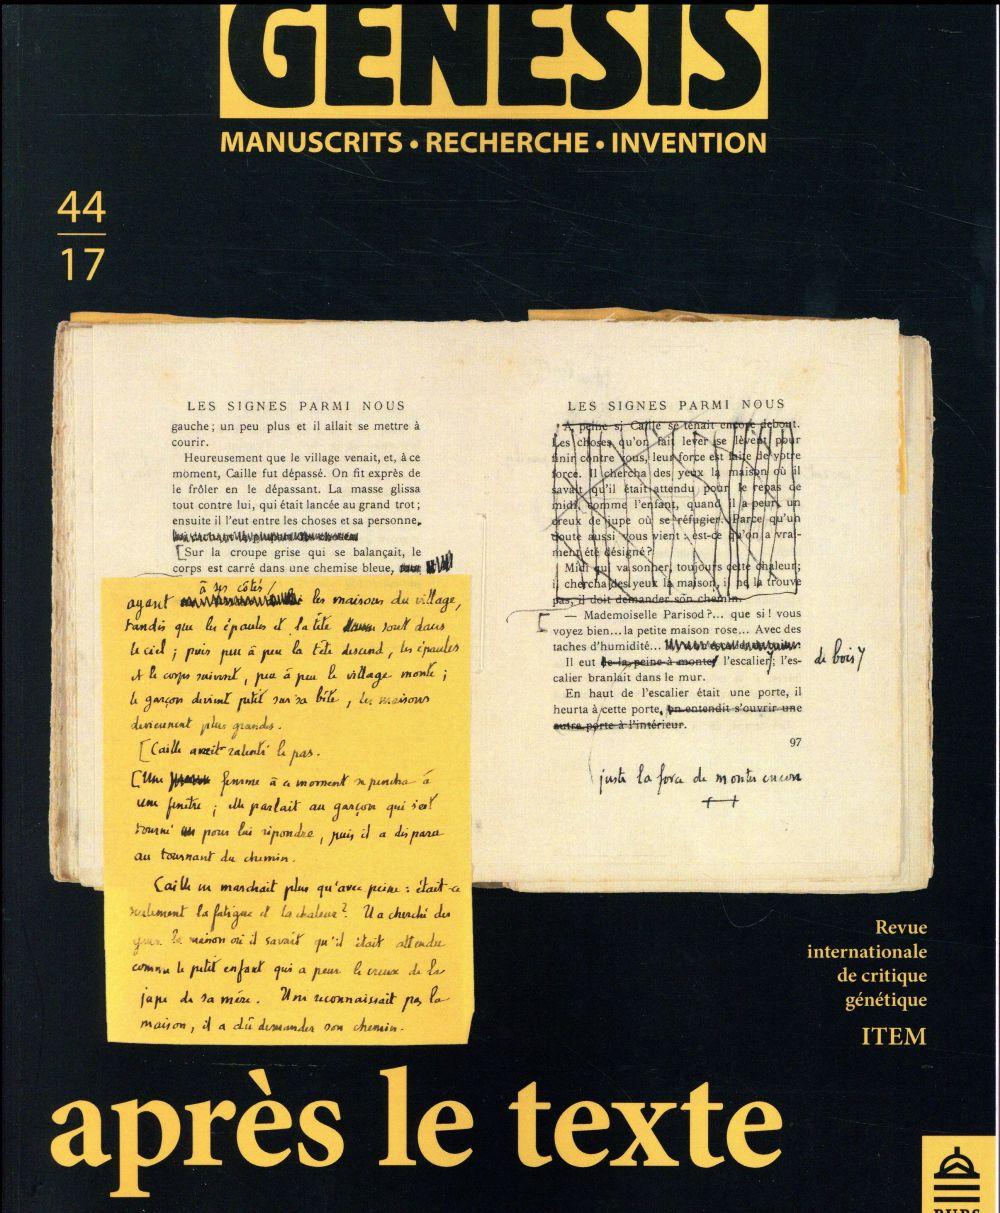 GENESIS 44 - APRES LE TEXTE. DE LA REECRITURE APRES PUBLICATION